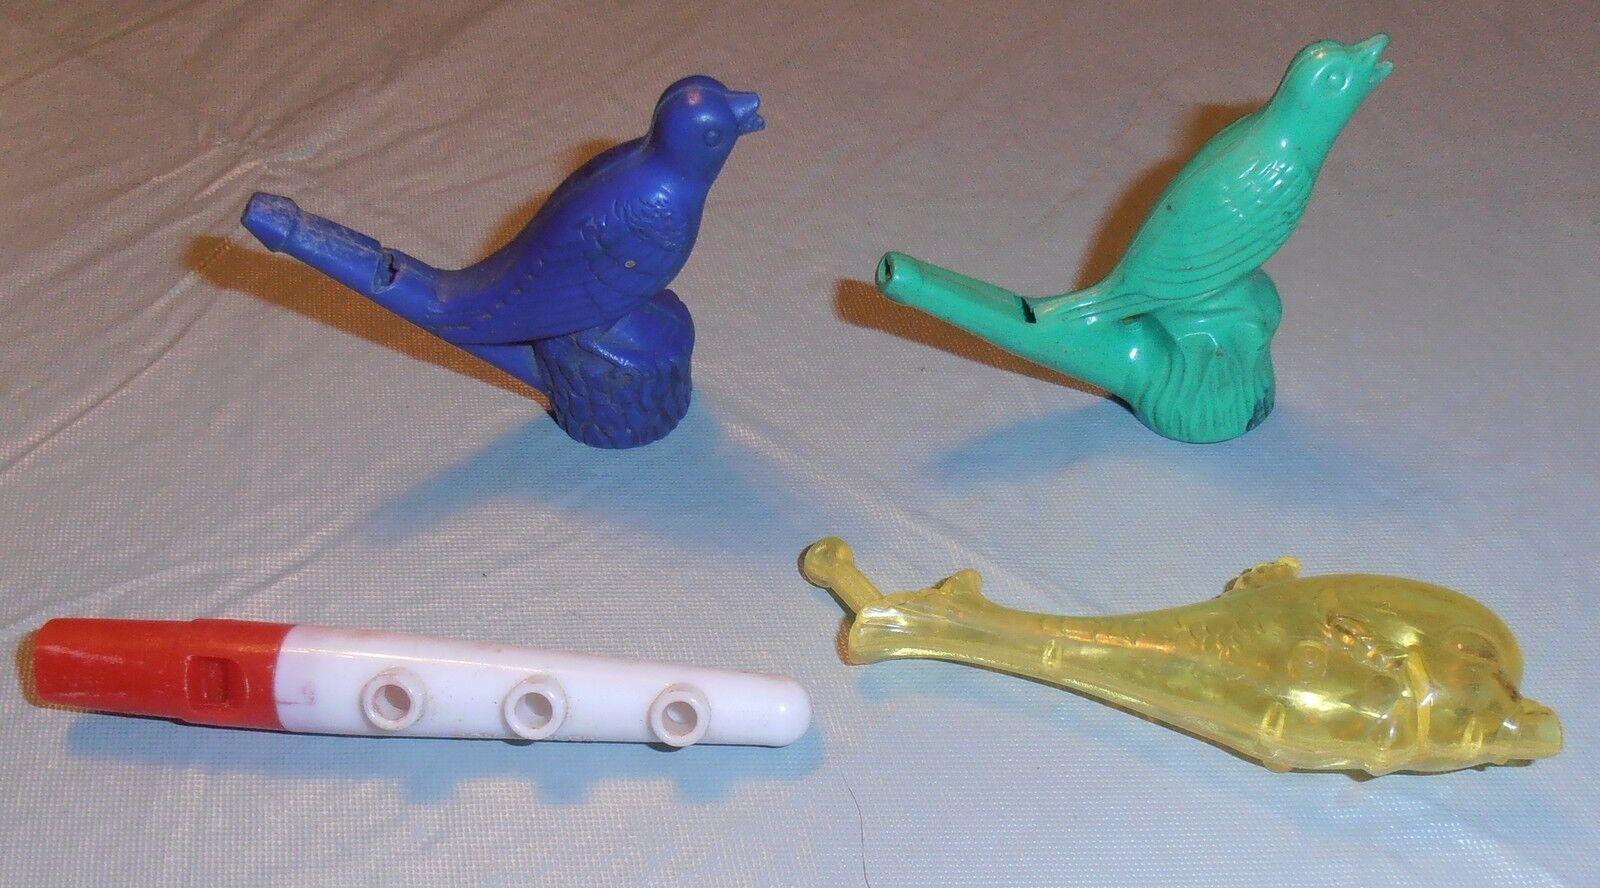 4 VINTAGE TOY PLASTIC WHISTLE LOT 2 BIRD FISH FLUTE BOY BUGLER